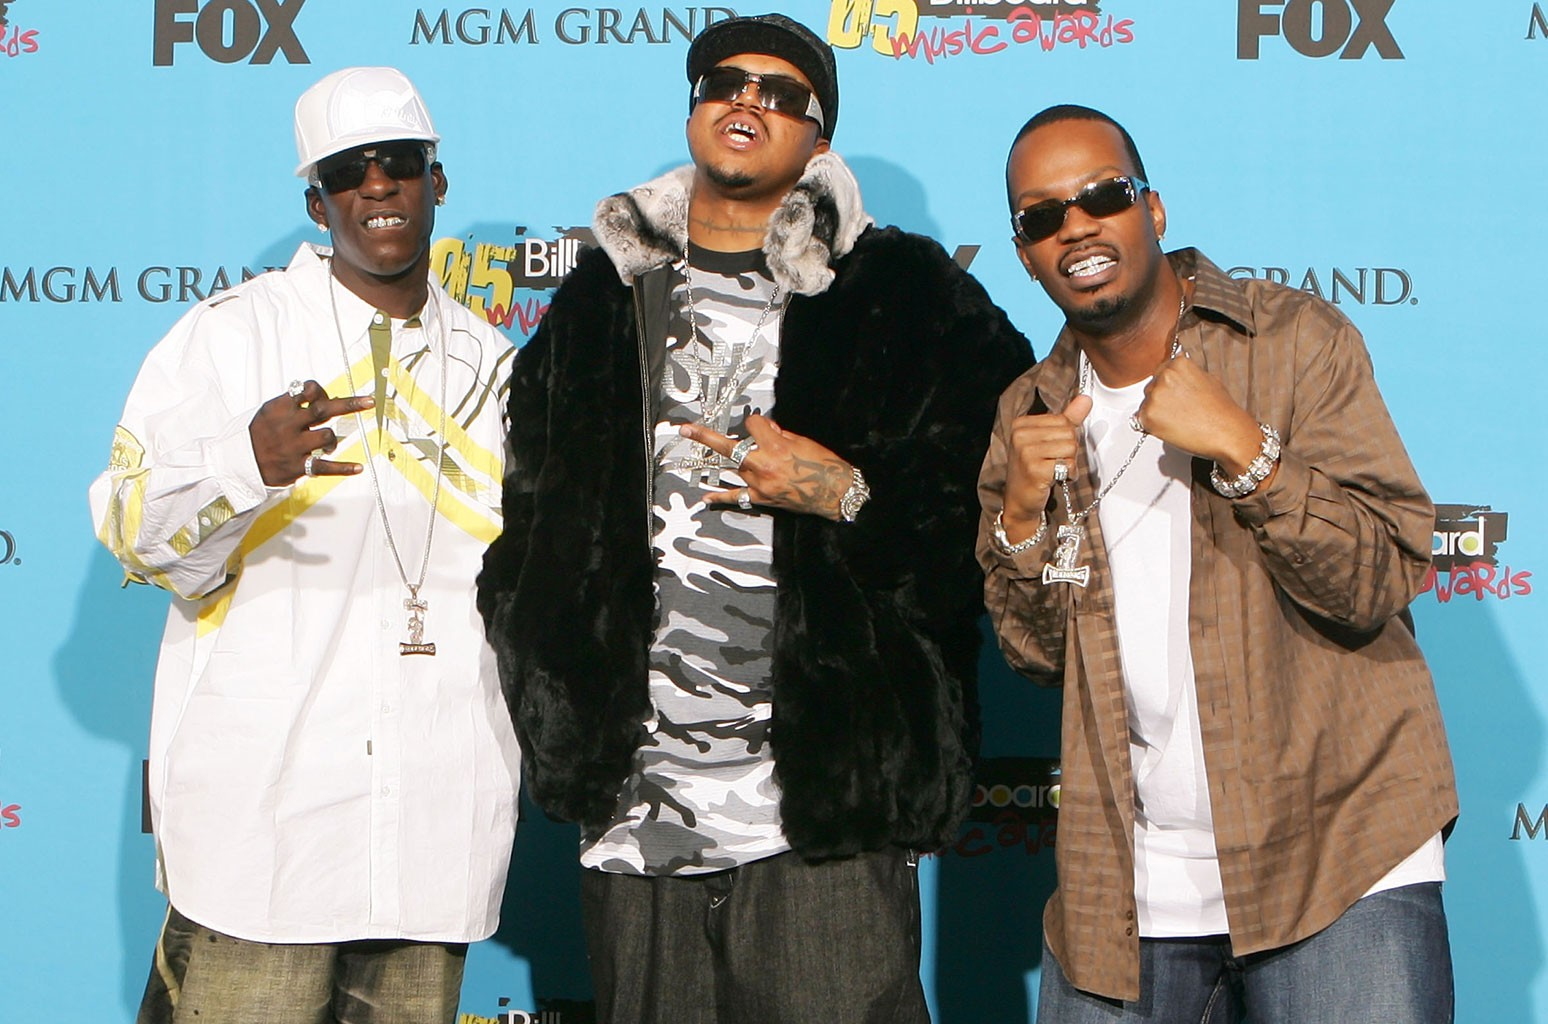 Three 6 Mafia Announces Socially Distanced Arena Concert Amid Pandemic